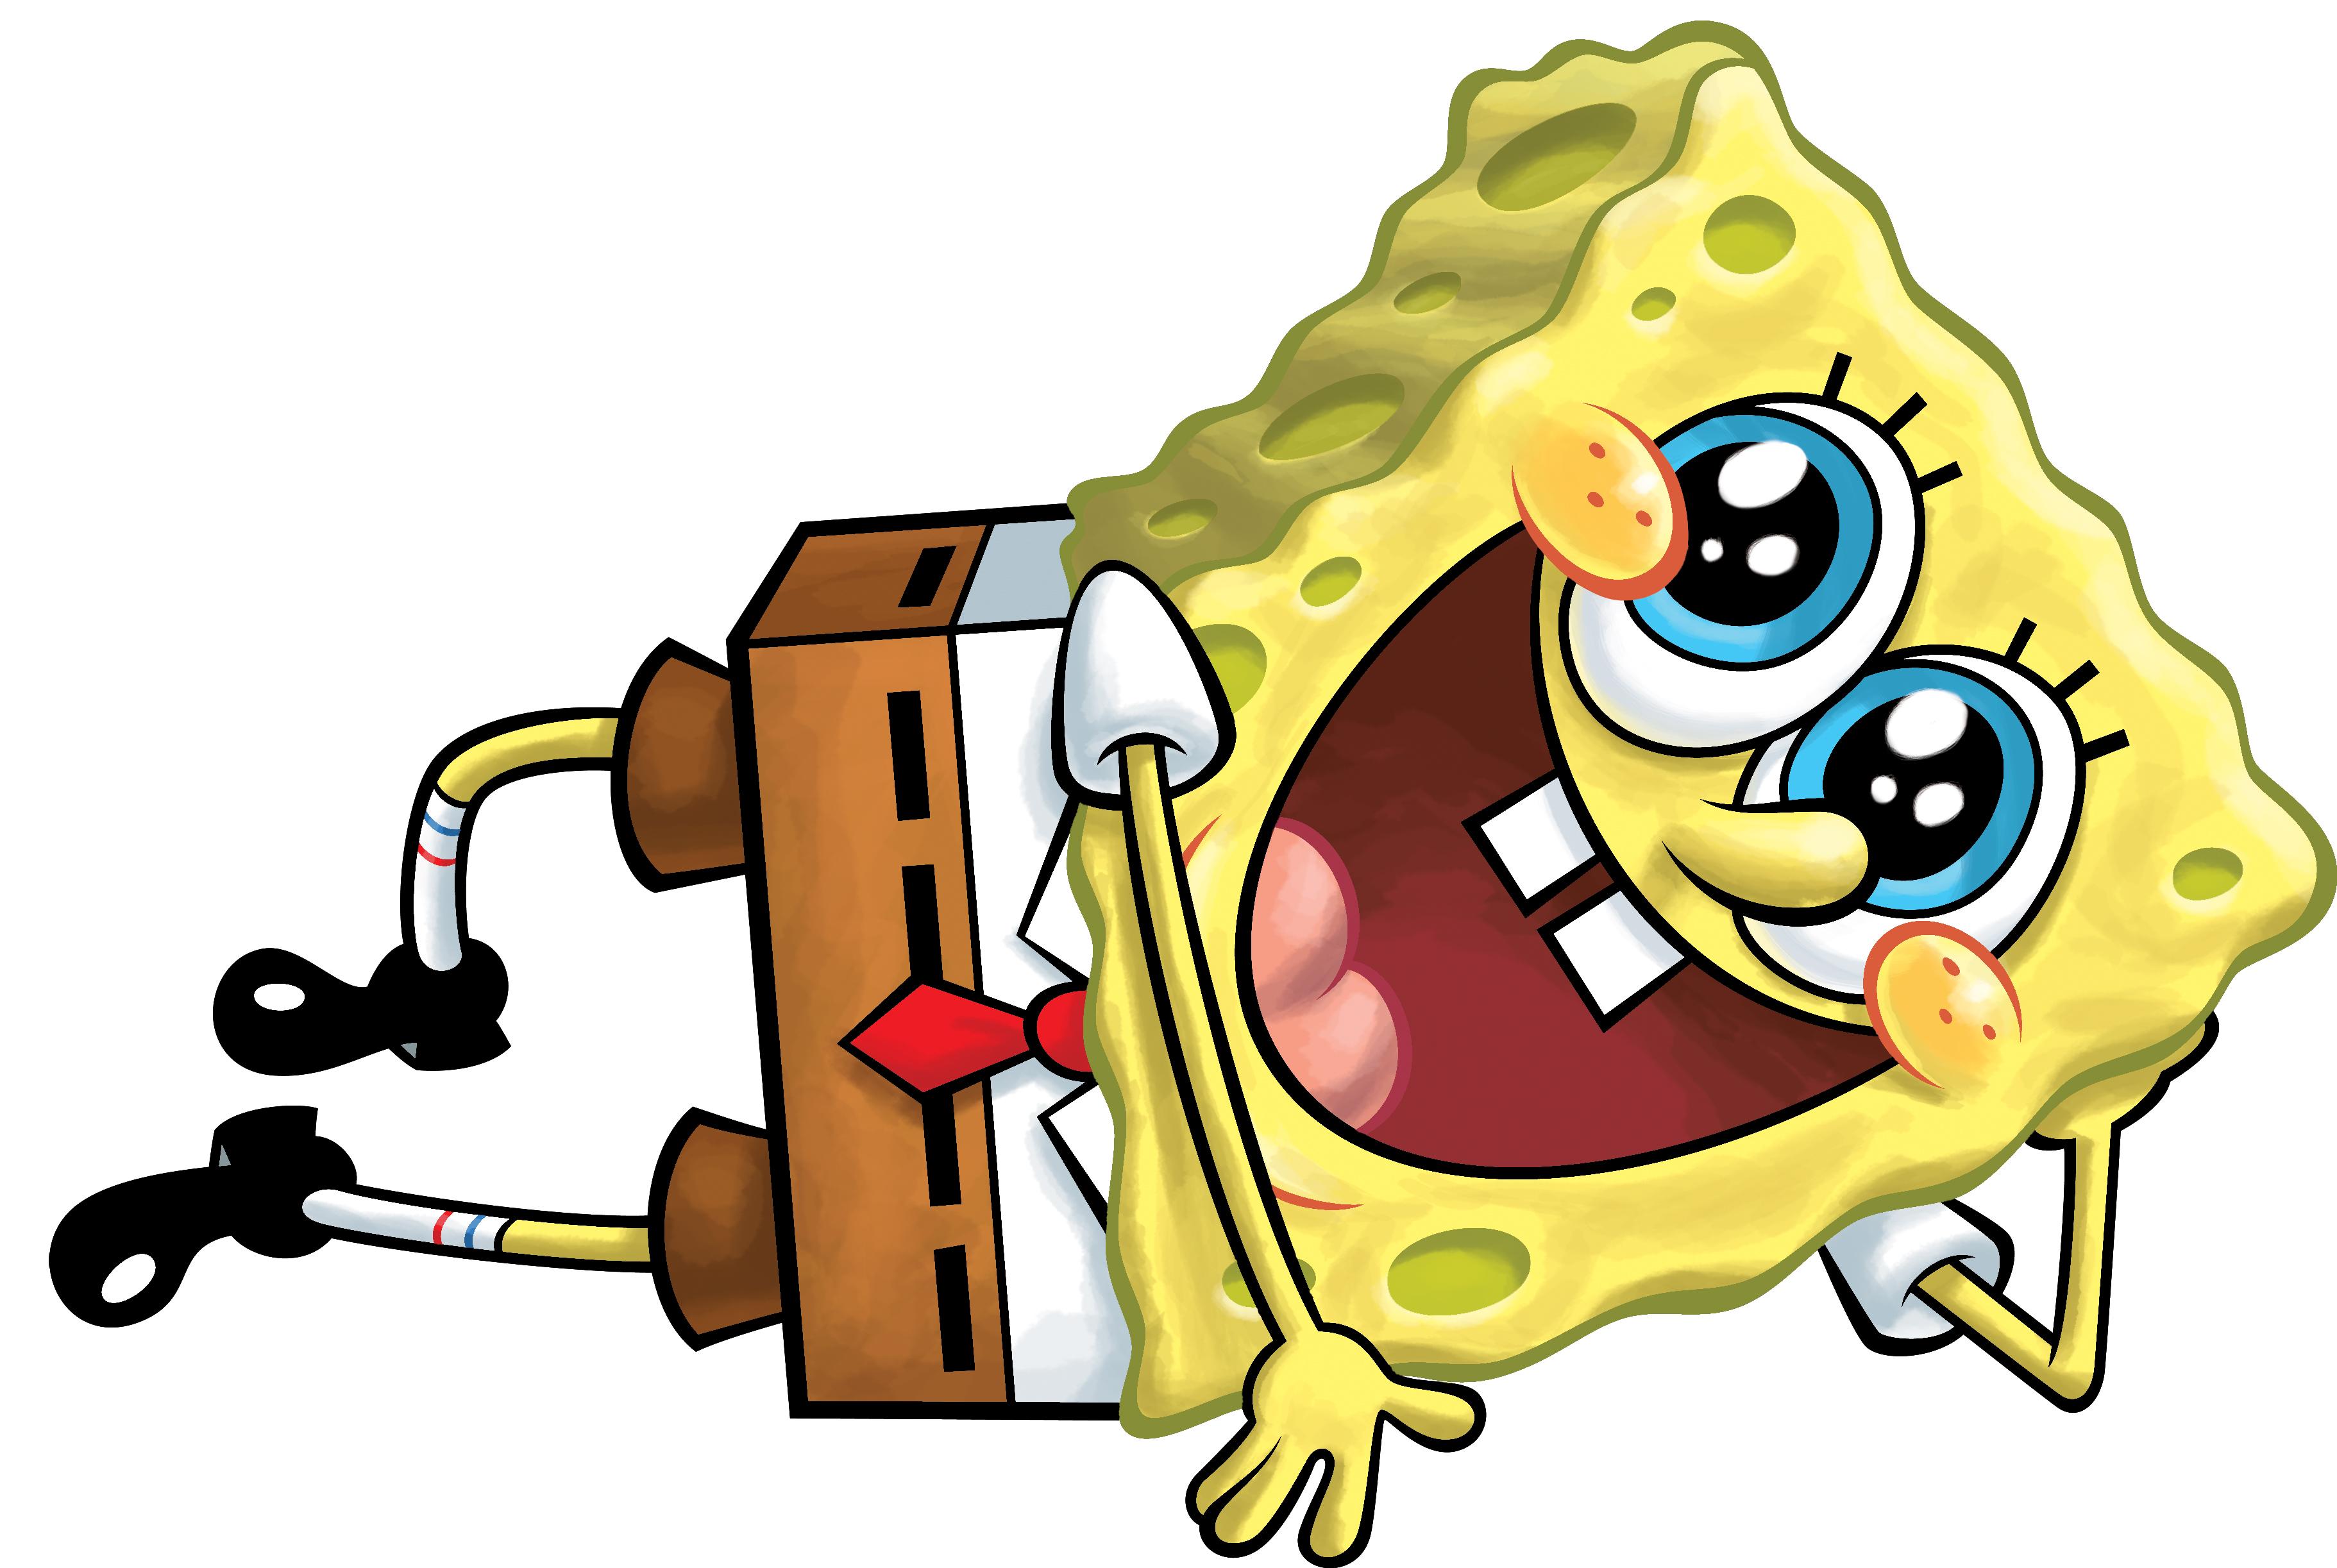 Spongebob Squarepants tw wallpaper | 3644x2445 | 98264 ...